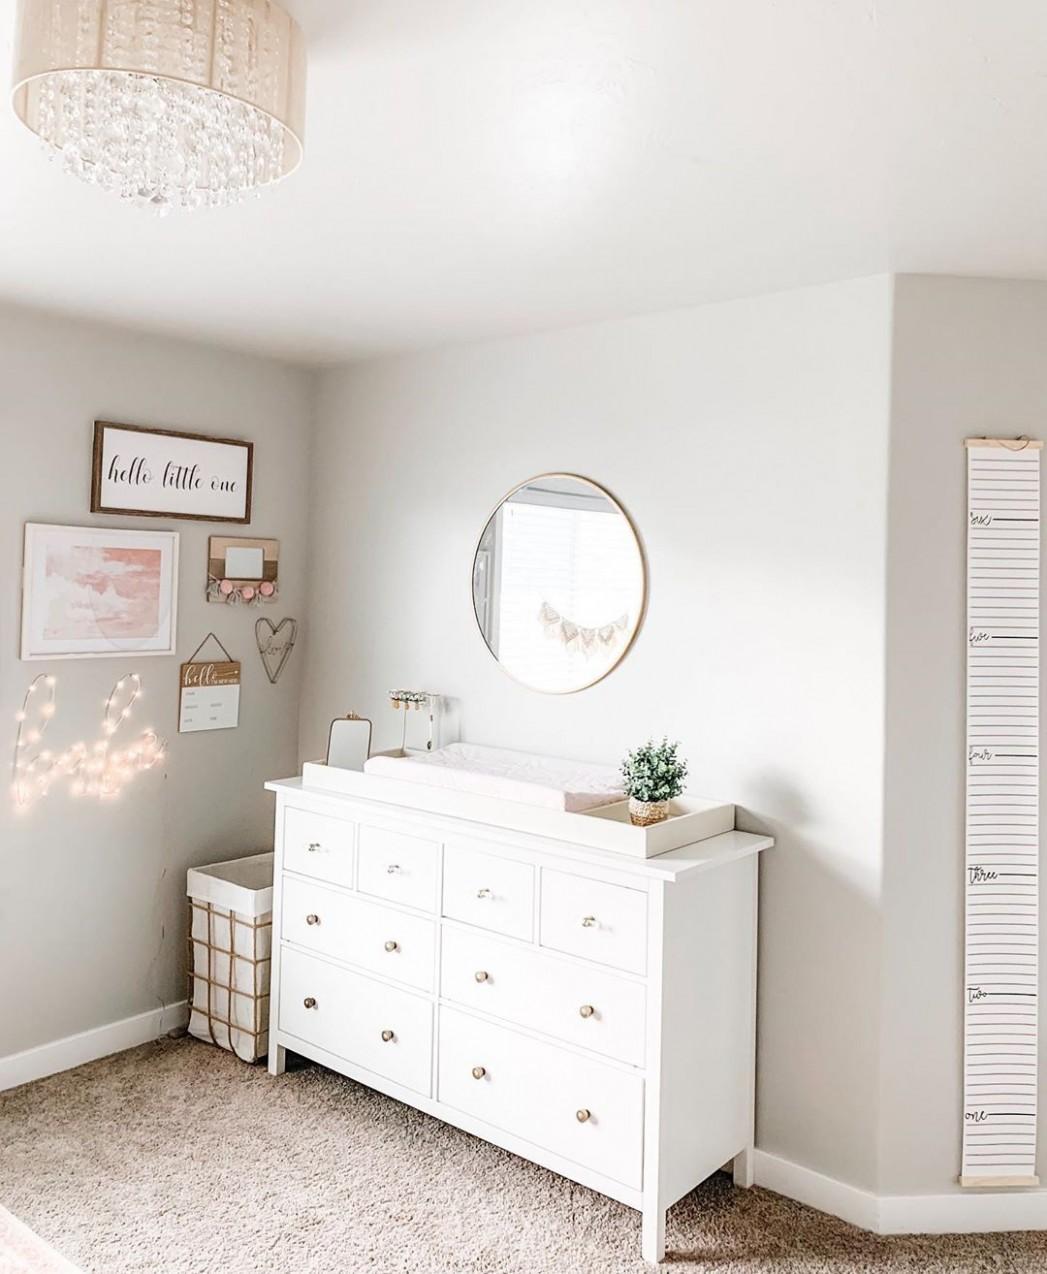 Pin on baby girl nursery ideas - Baby Room Mirror